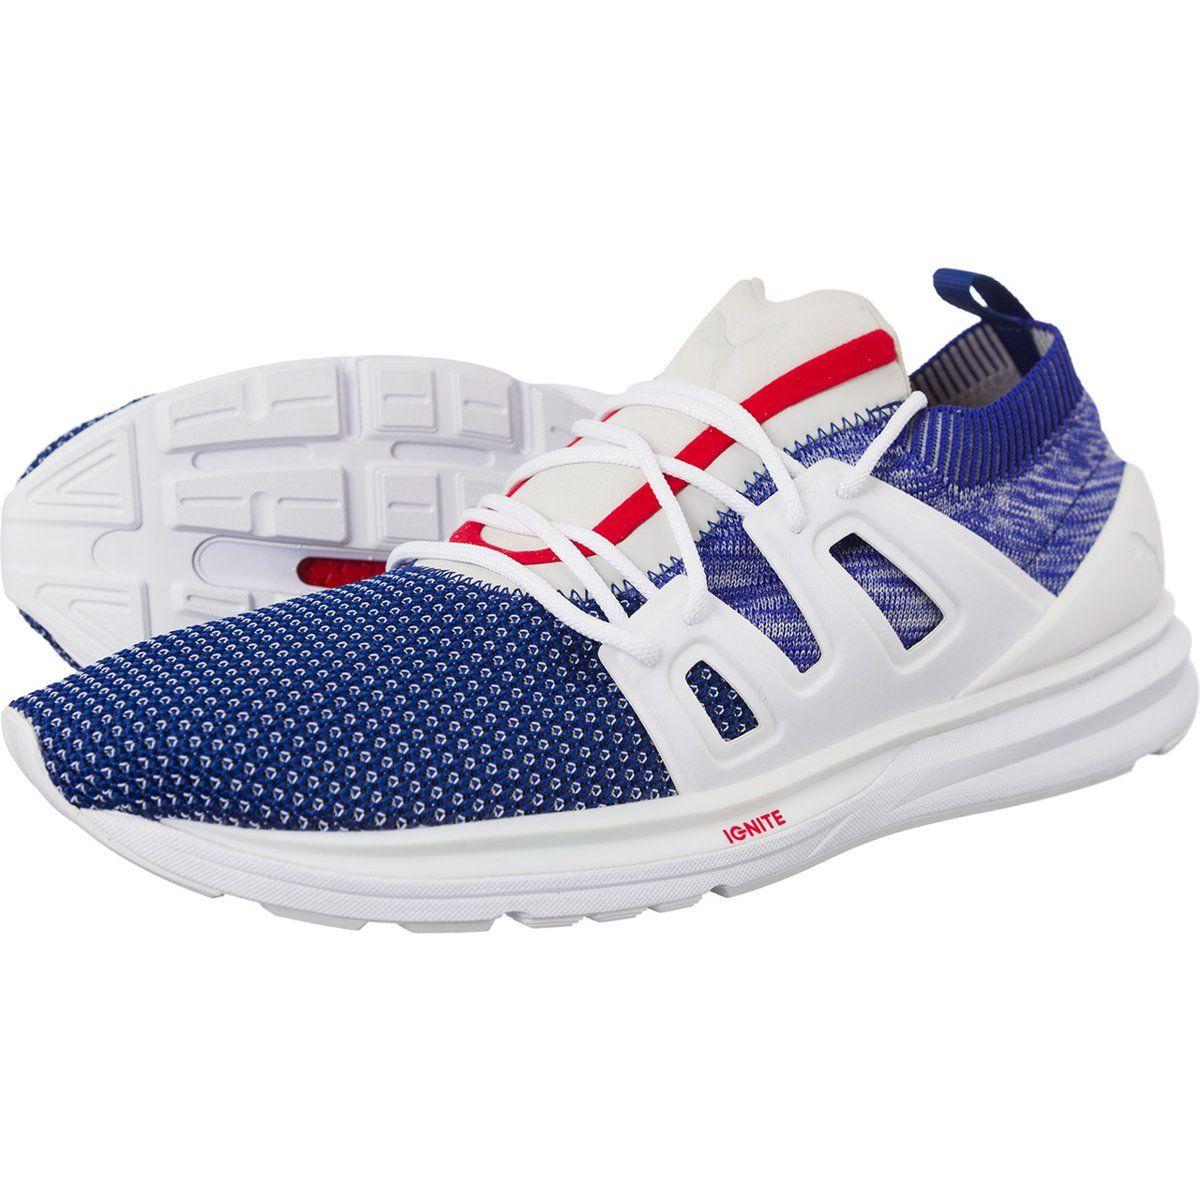 Sportowe Damskie Puma Puma B O G Limitless Lo Evo Knit 904 Sketchers Sneakers Shoes Puma